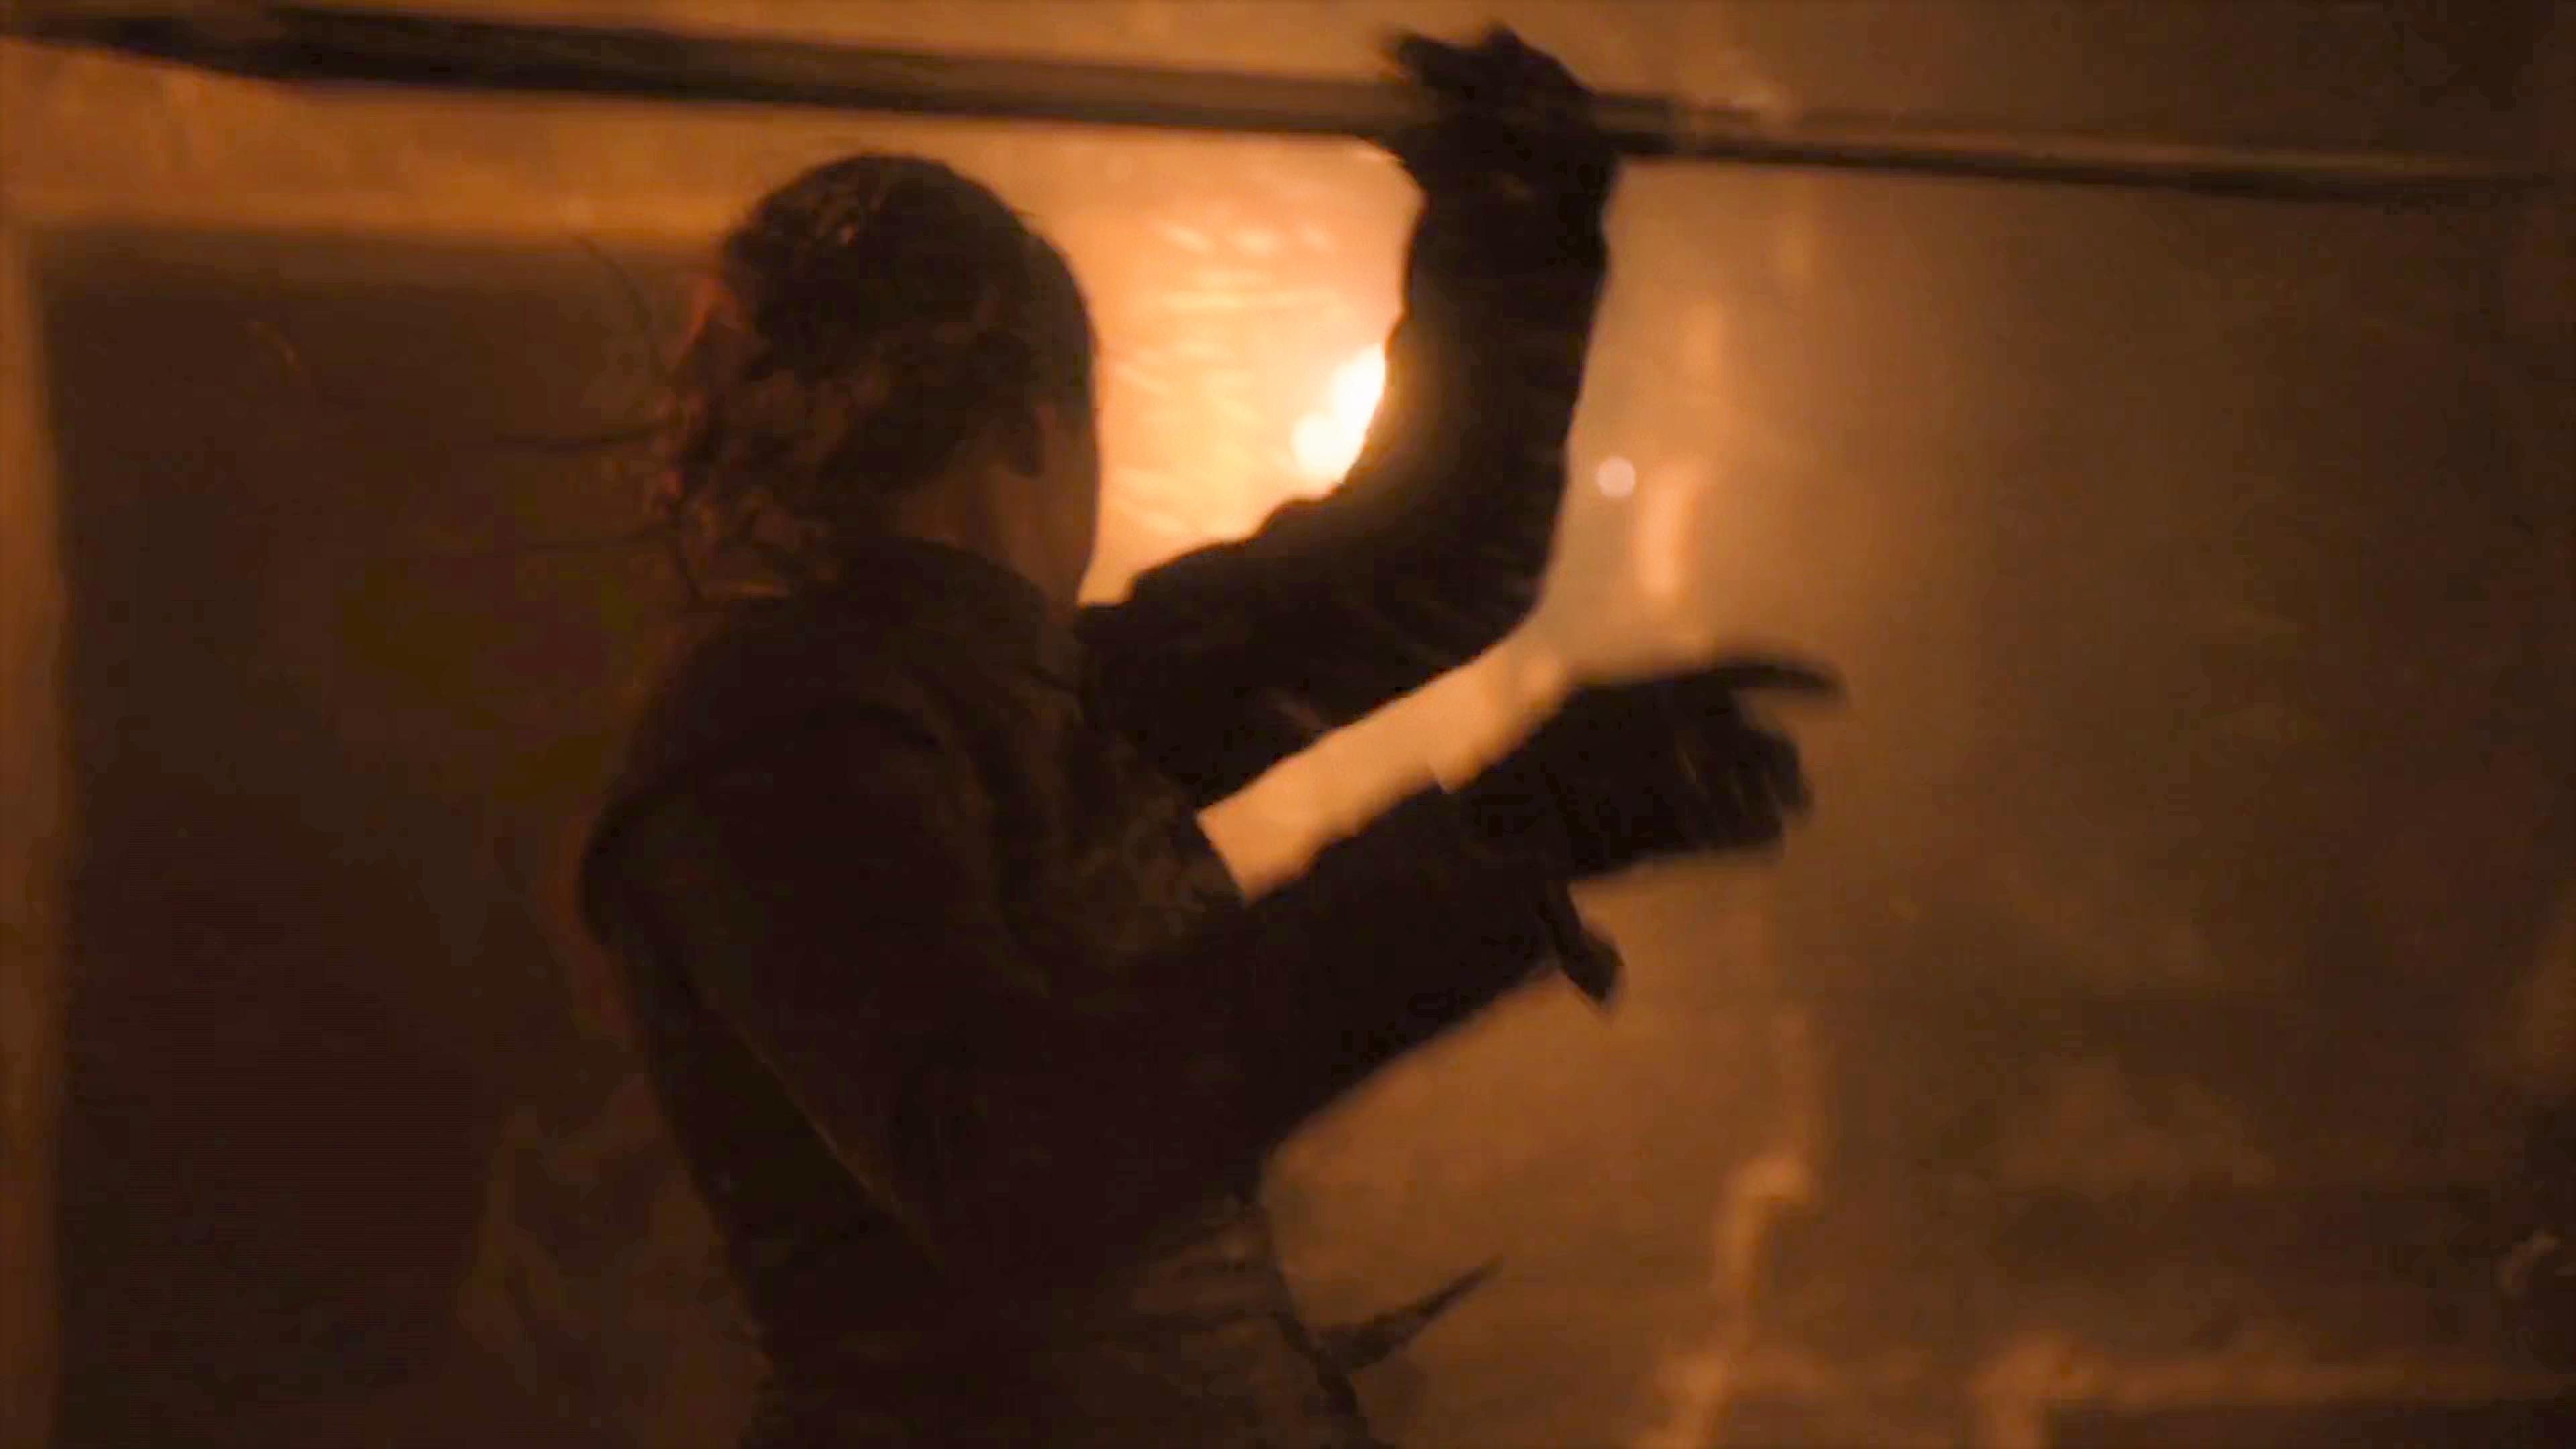 41. Season 8 Trailer Arya Stark Winterfell Battle